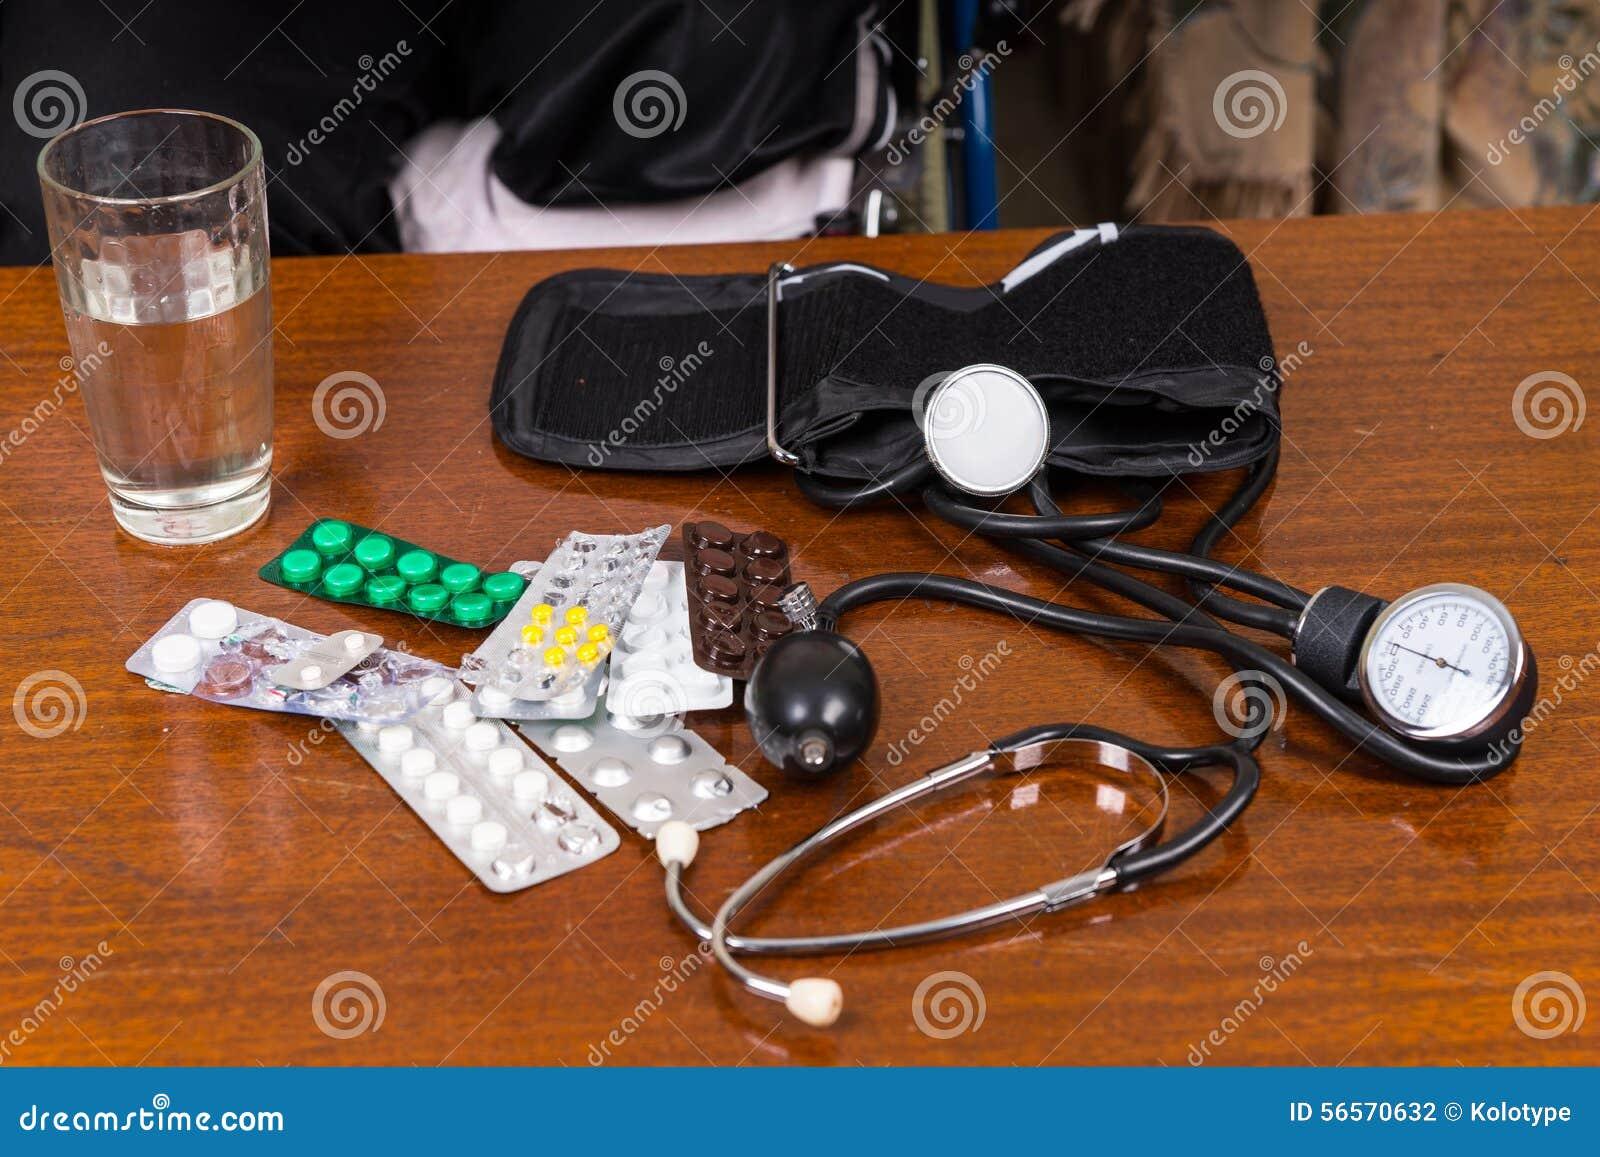 Download Μανσέτα πίεσης του αίματος στον πίνακα με τα φάρμακα Στοκ Εικόνες - εικόνα από σπίτι, πακέτο: 56570632